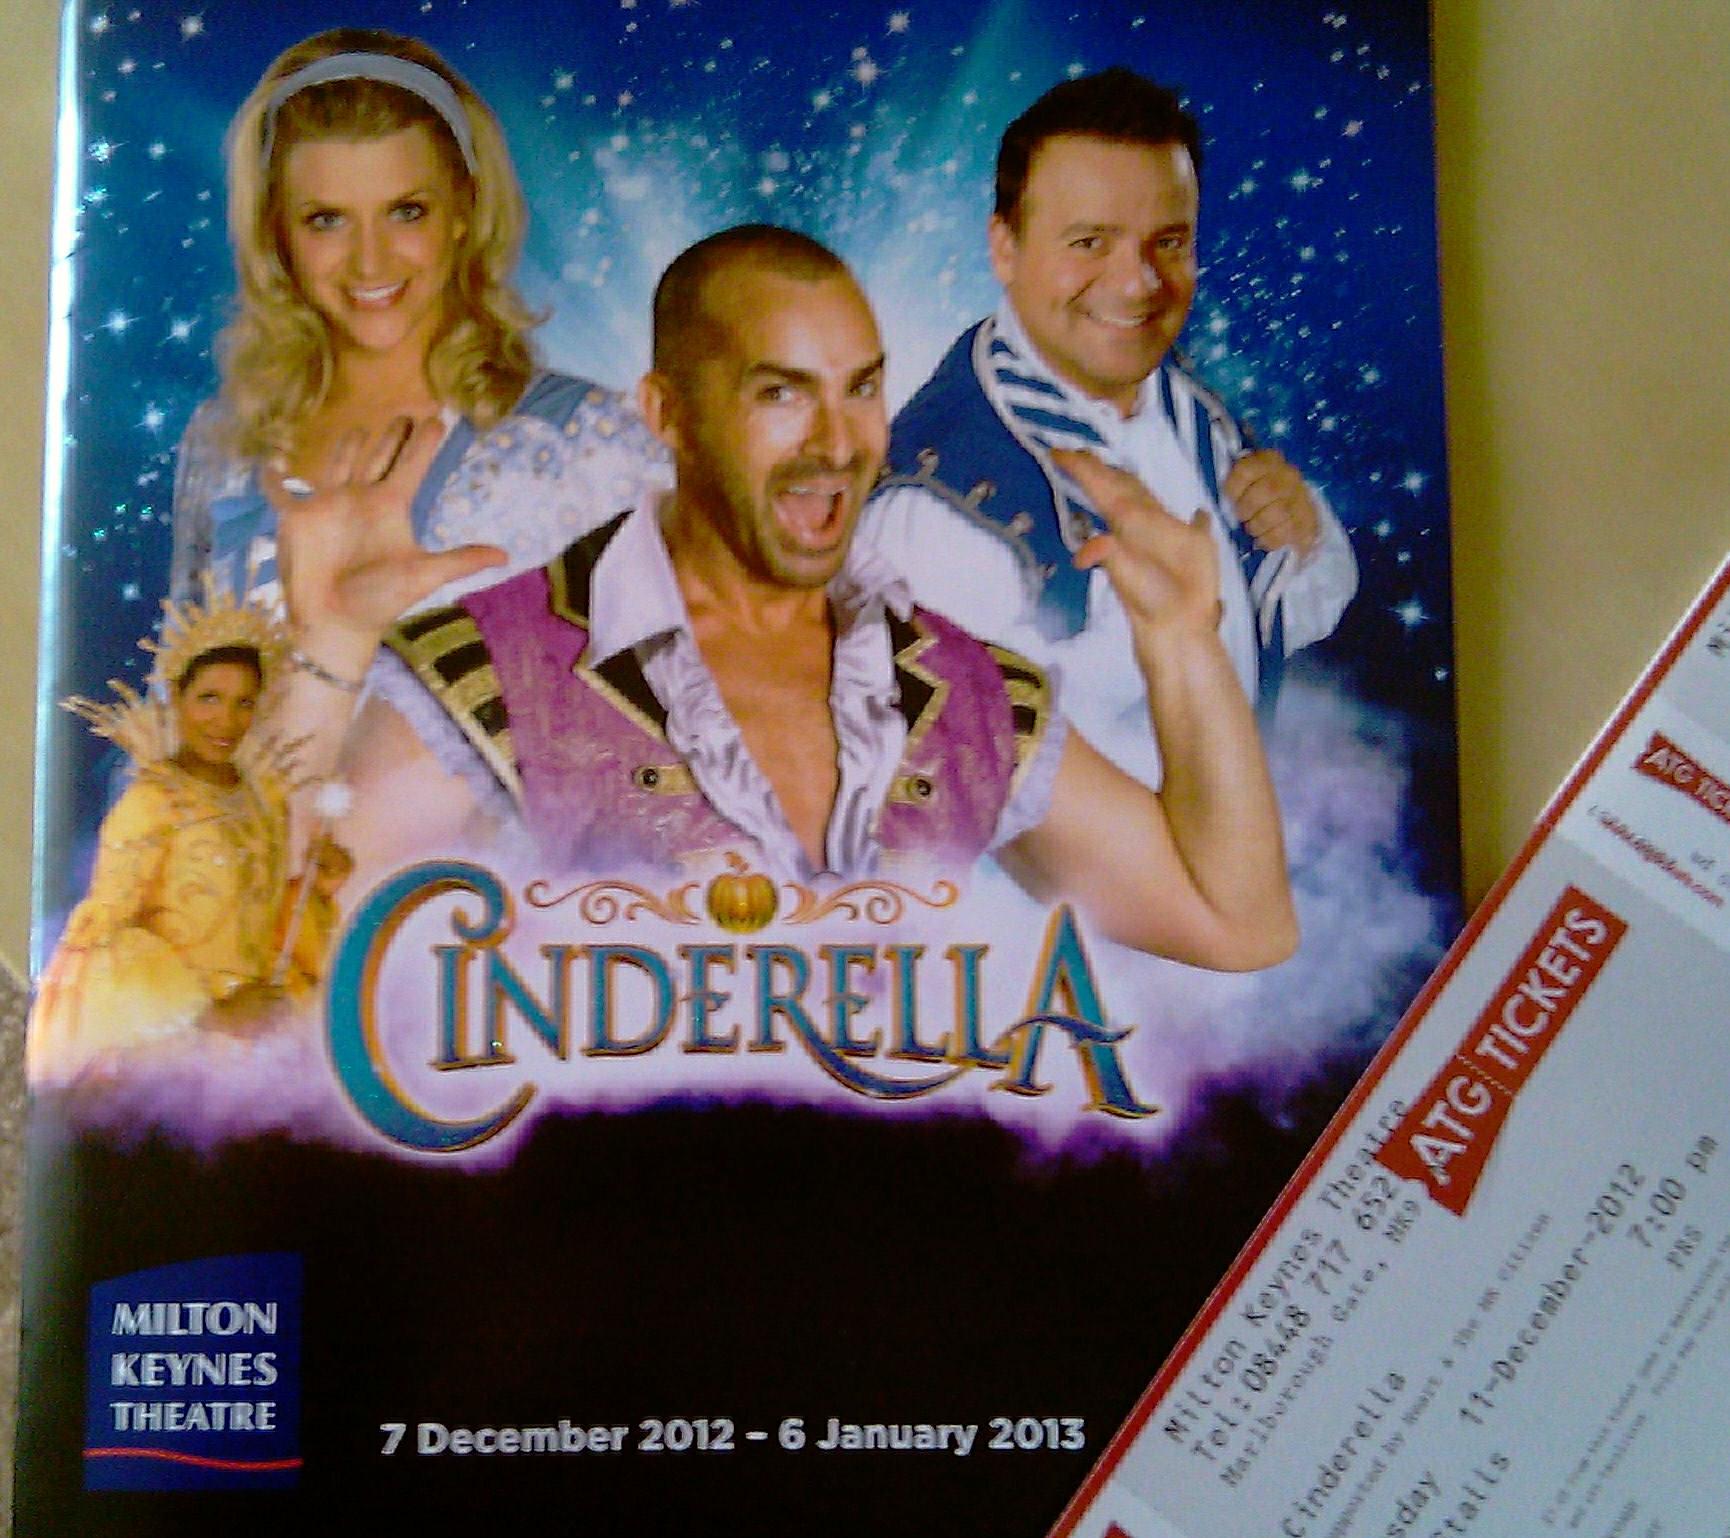 Milton Keynes Theatre pantomime Christmas 2012. Cinderella programme and ticket.